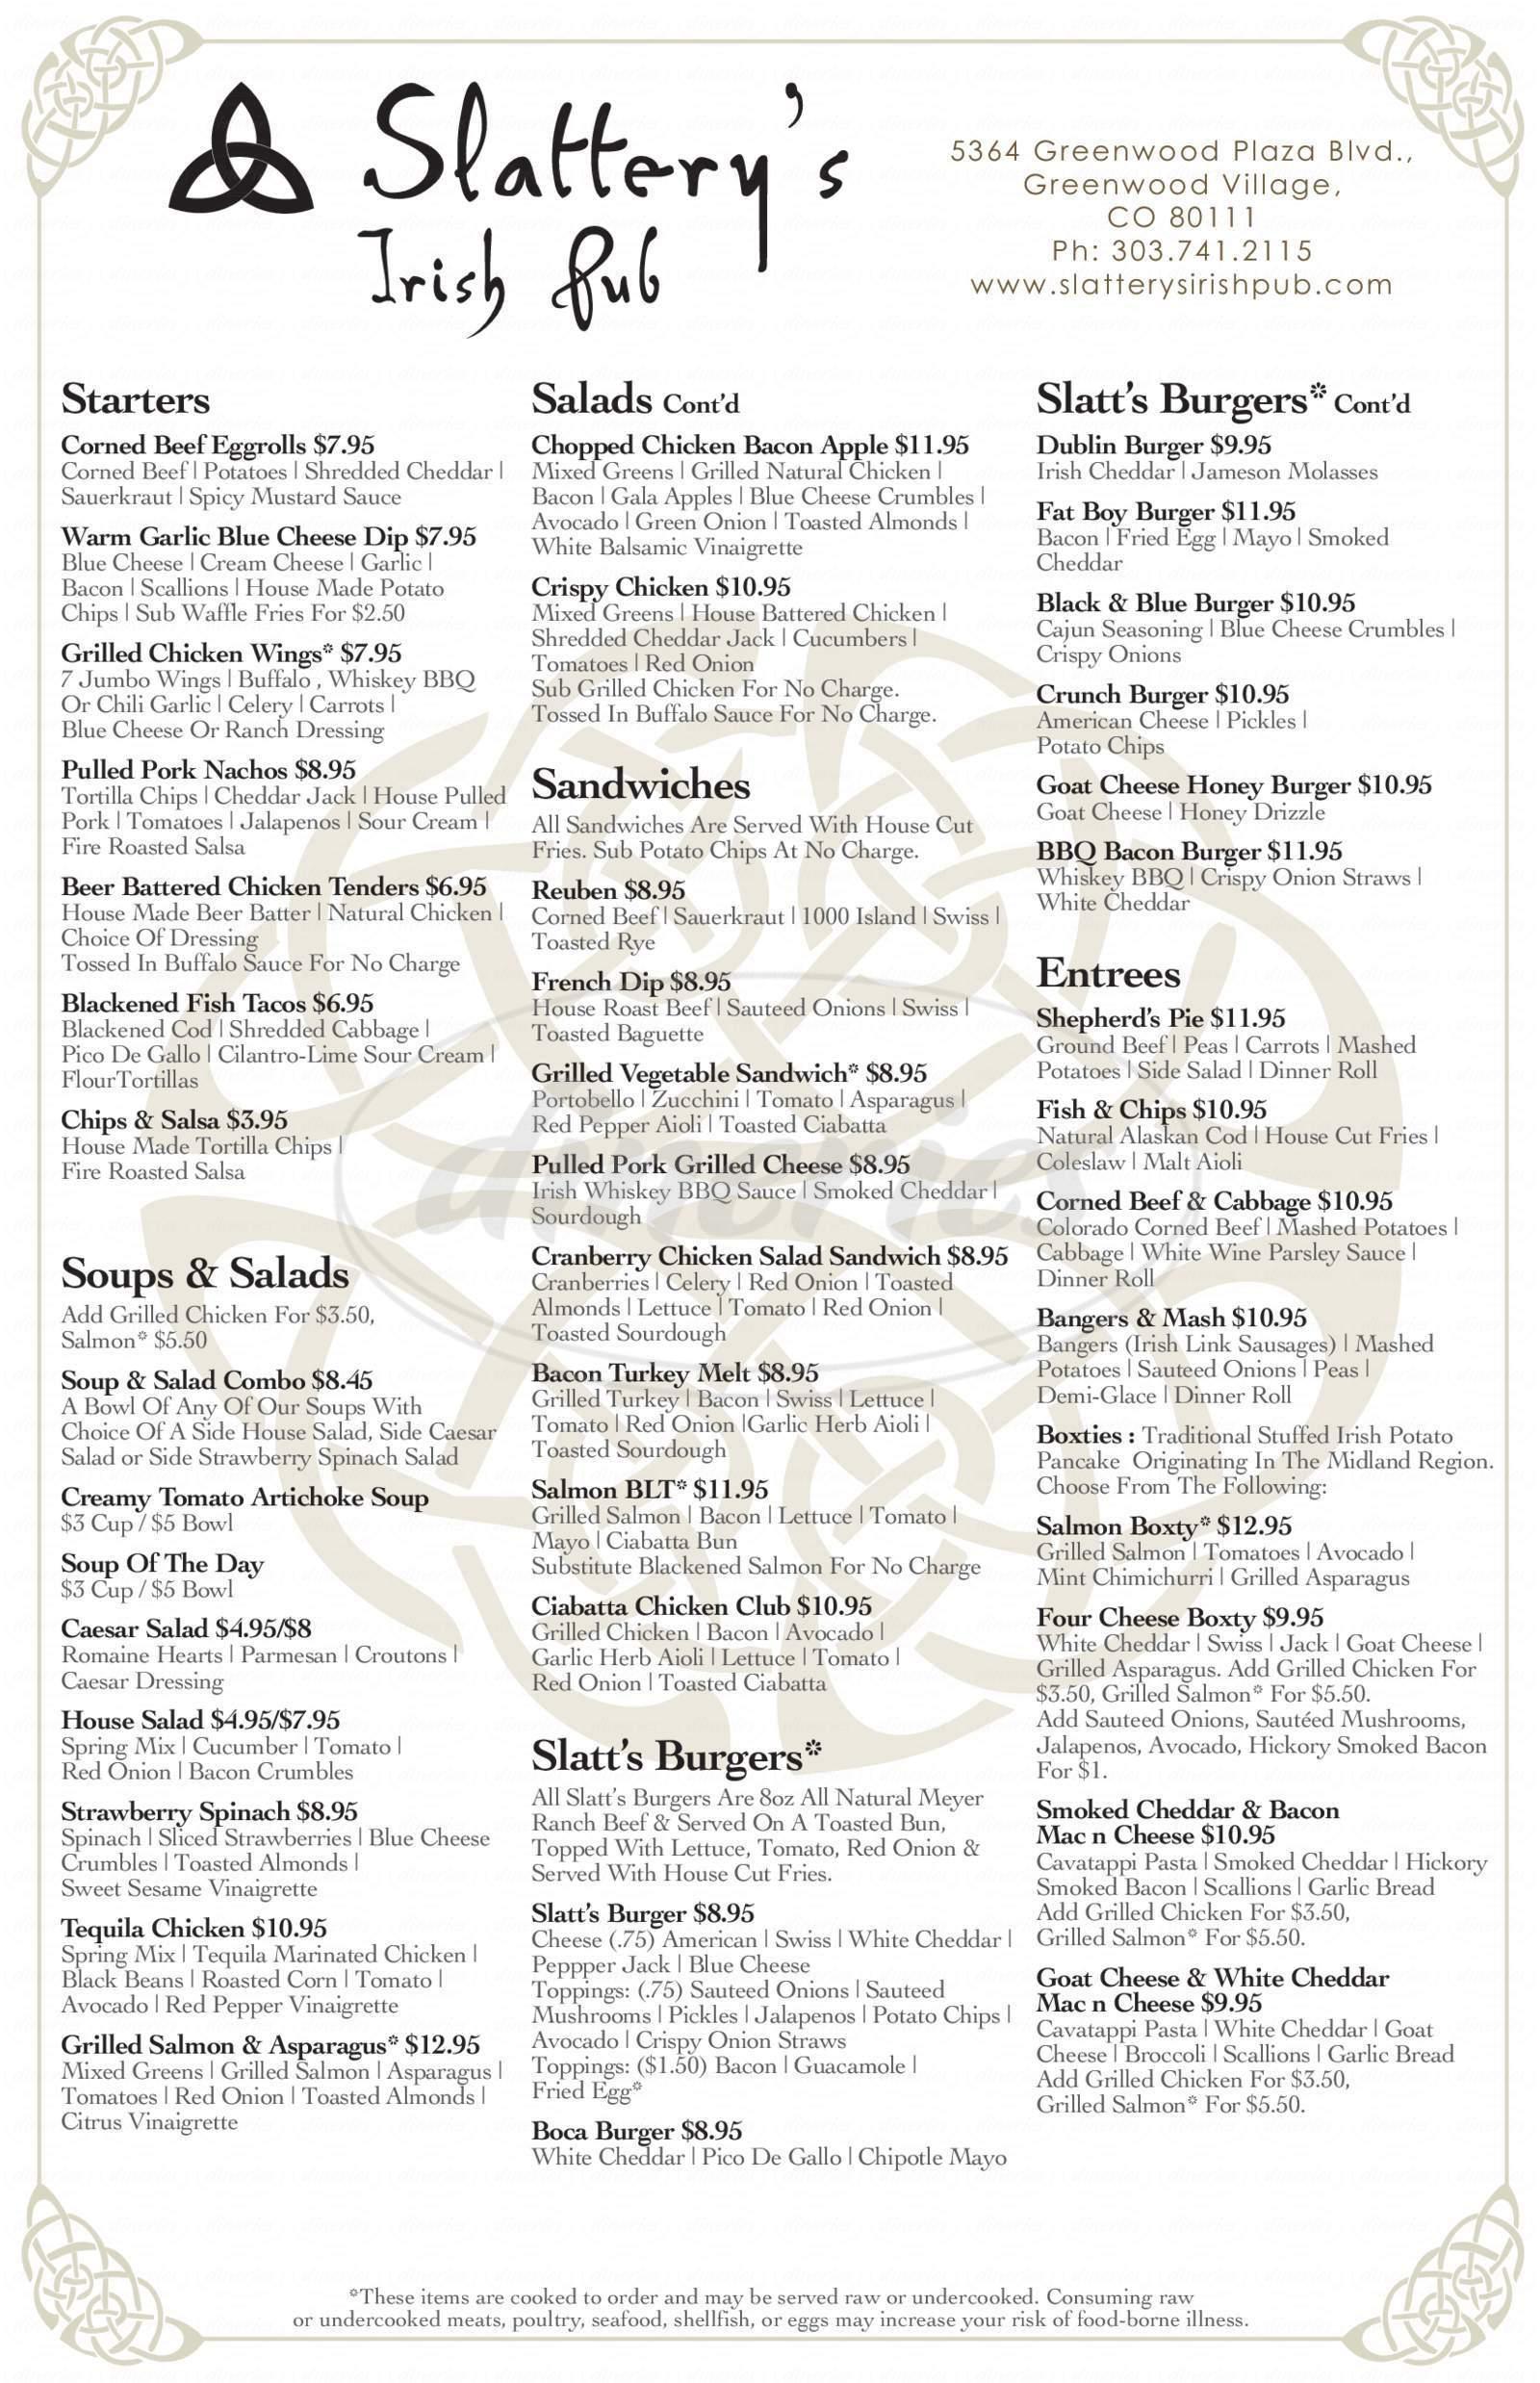 menu for Slattery's Irish Pub